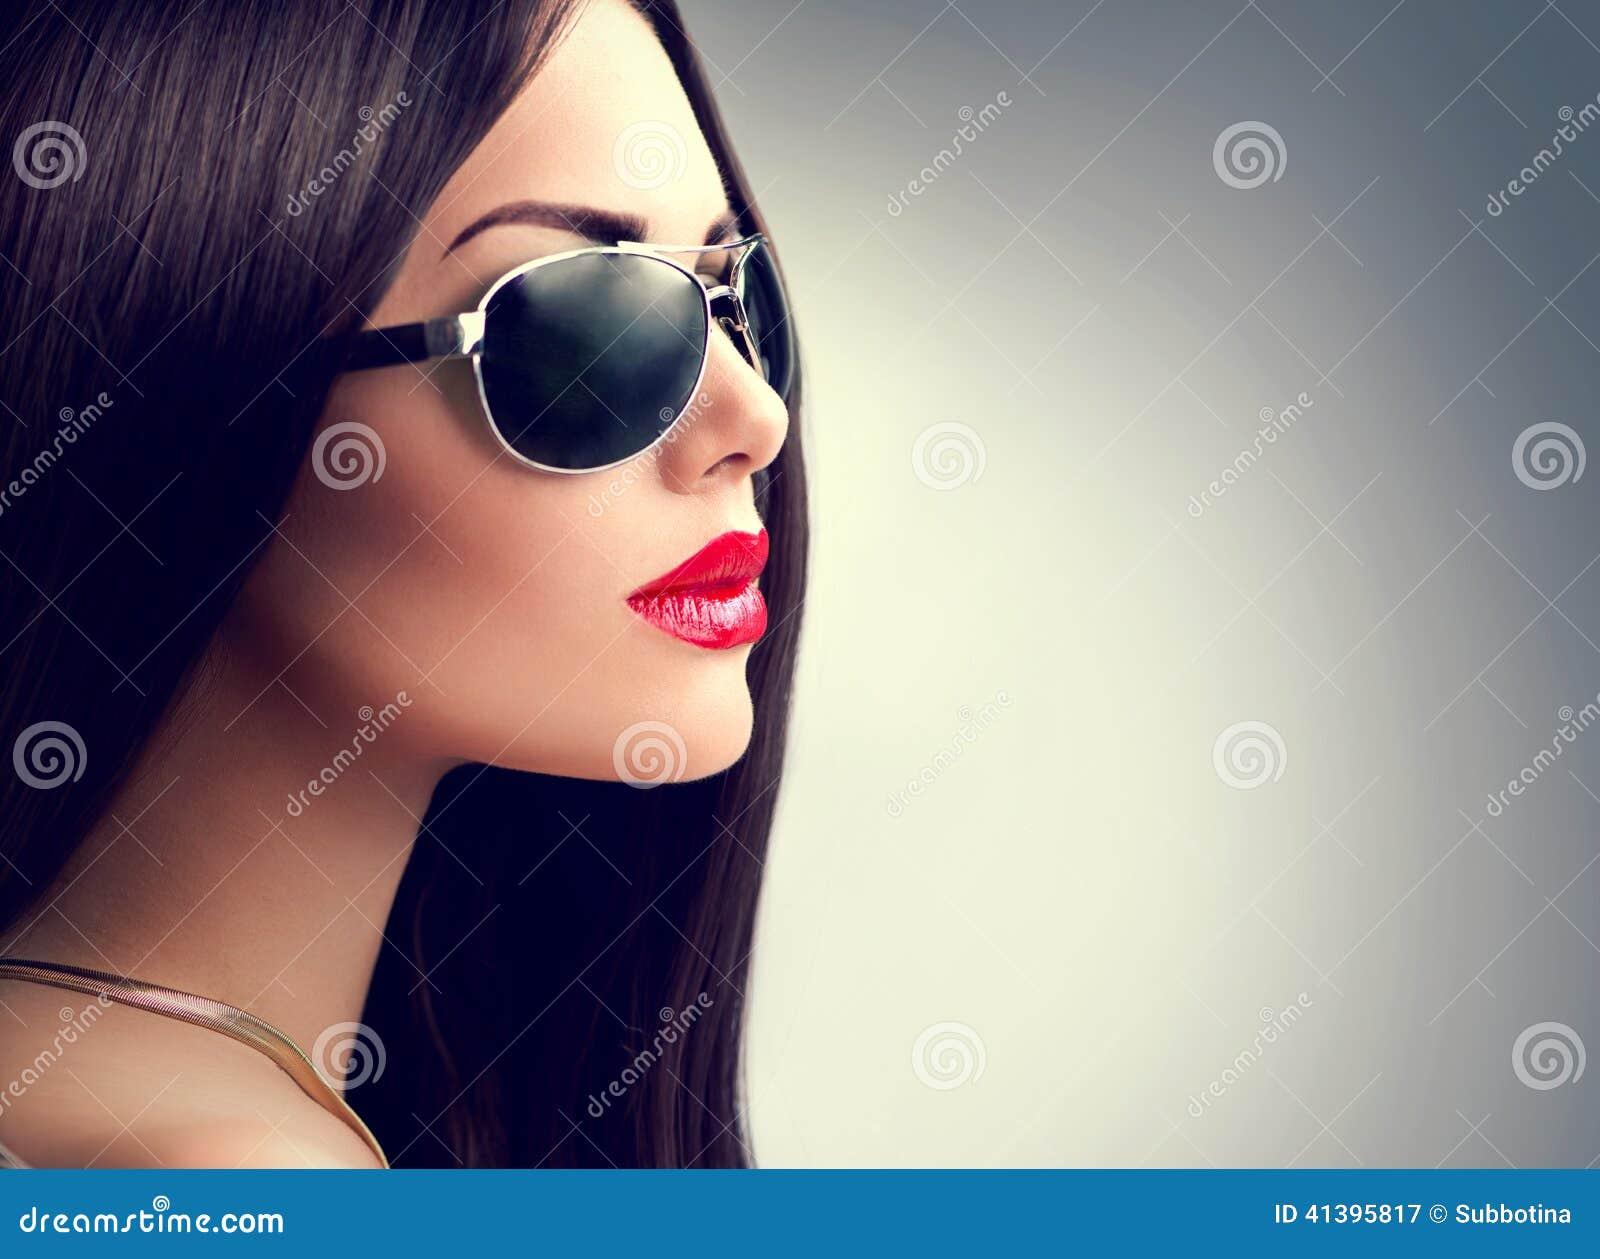 Download Beauty Model Girl Wearing Sunglasses Stock Image - Image of elegance, aviator: 41395817